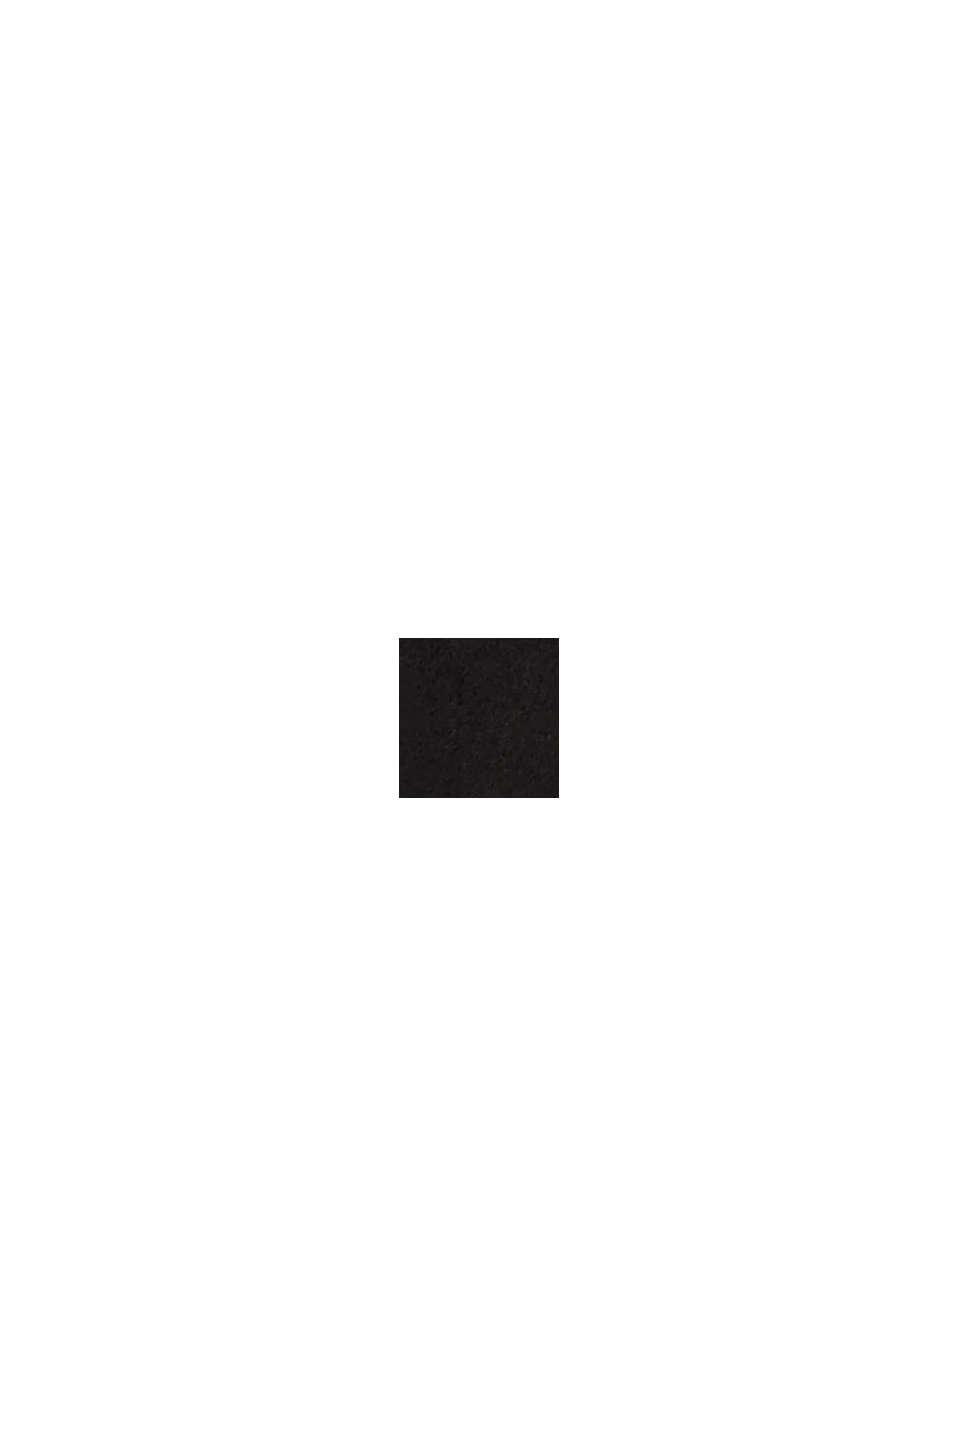 Ceinture en cuir / Ceinture confectionnée en cuir, BLACK, swatch